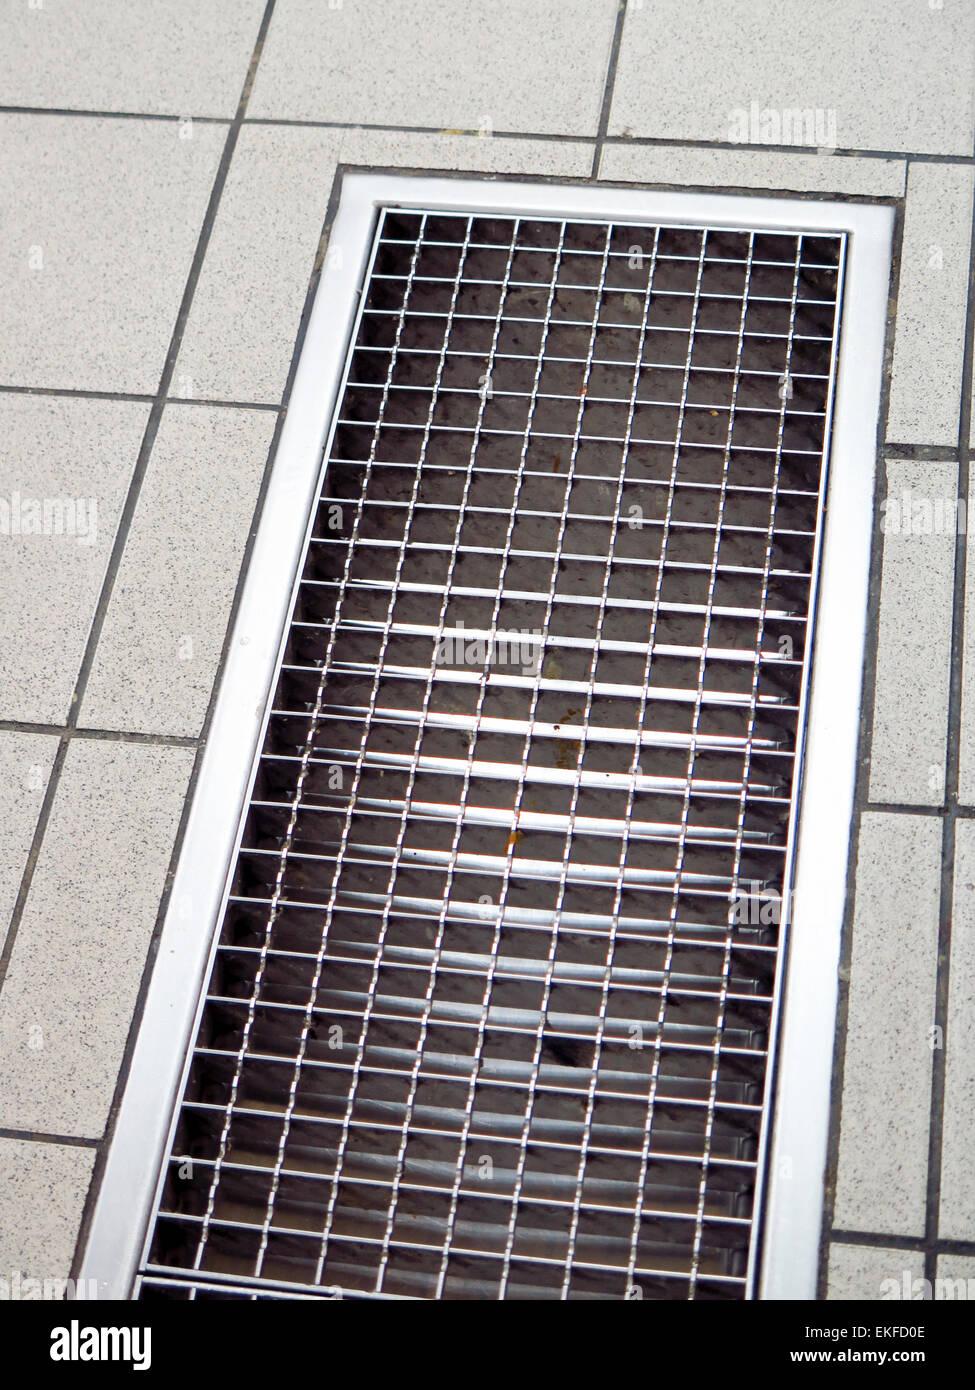 https www alamy com stock photo floor drain in commercial kitchen 80859422 html